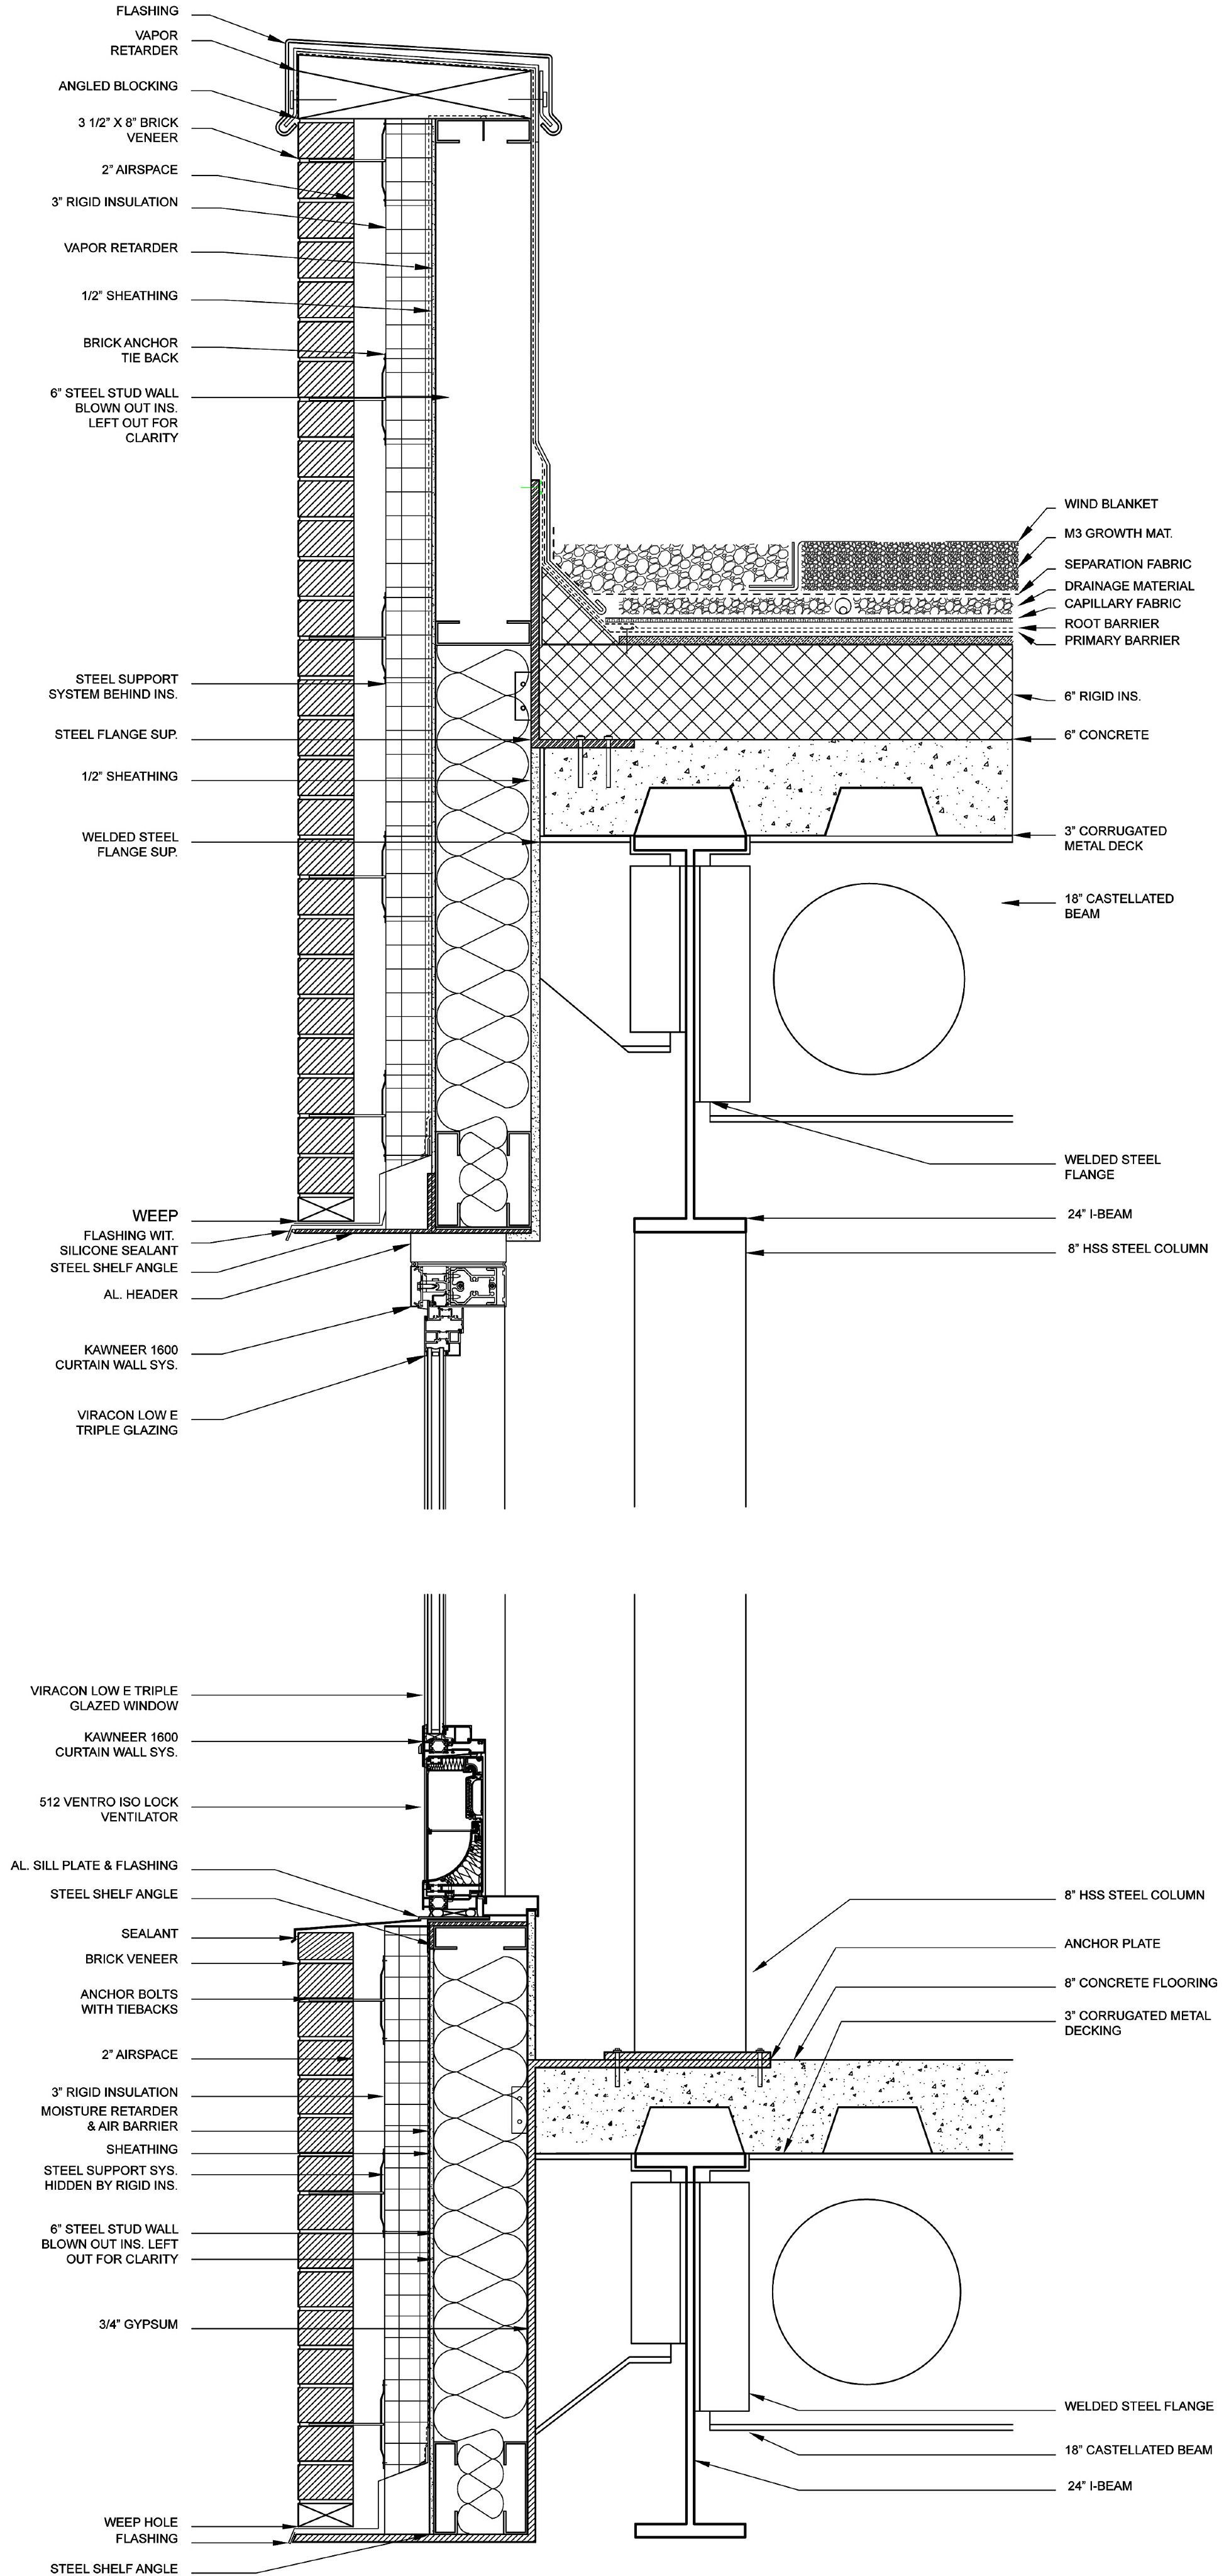 60 Fresh Curtain Wall Door Jamb Detail In 2020 Curtain Wall Detail Roof Detail Wall Section Detail